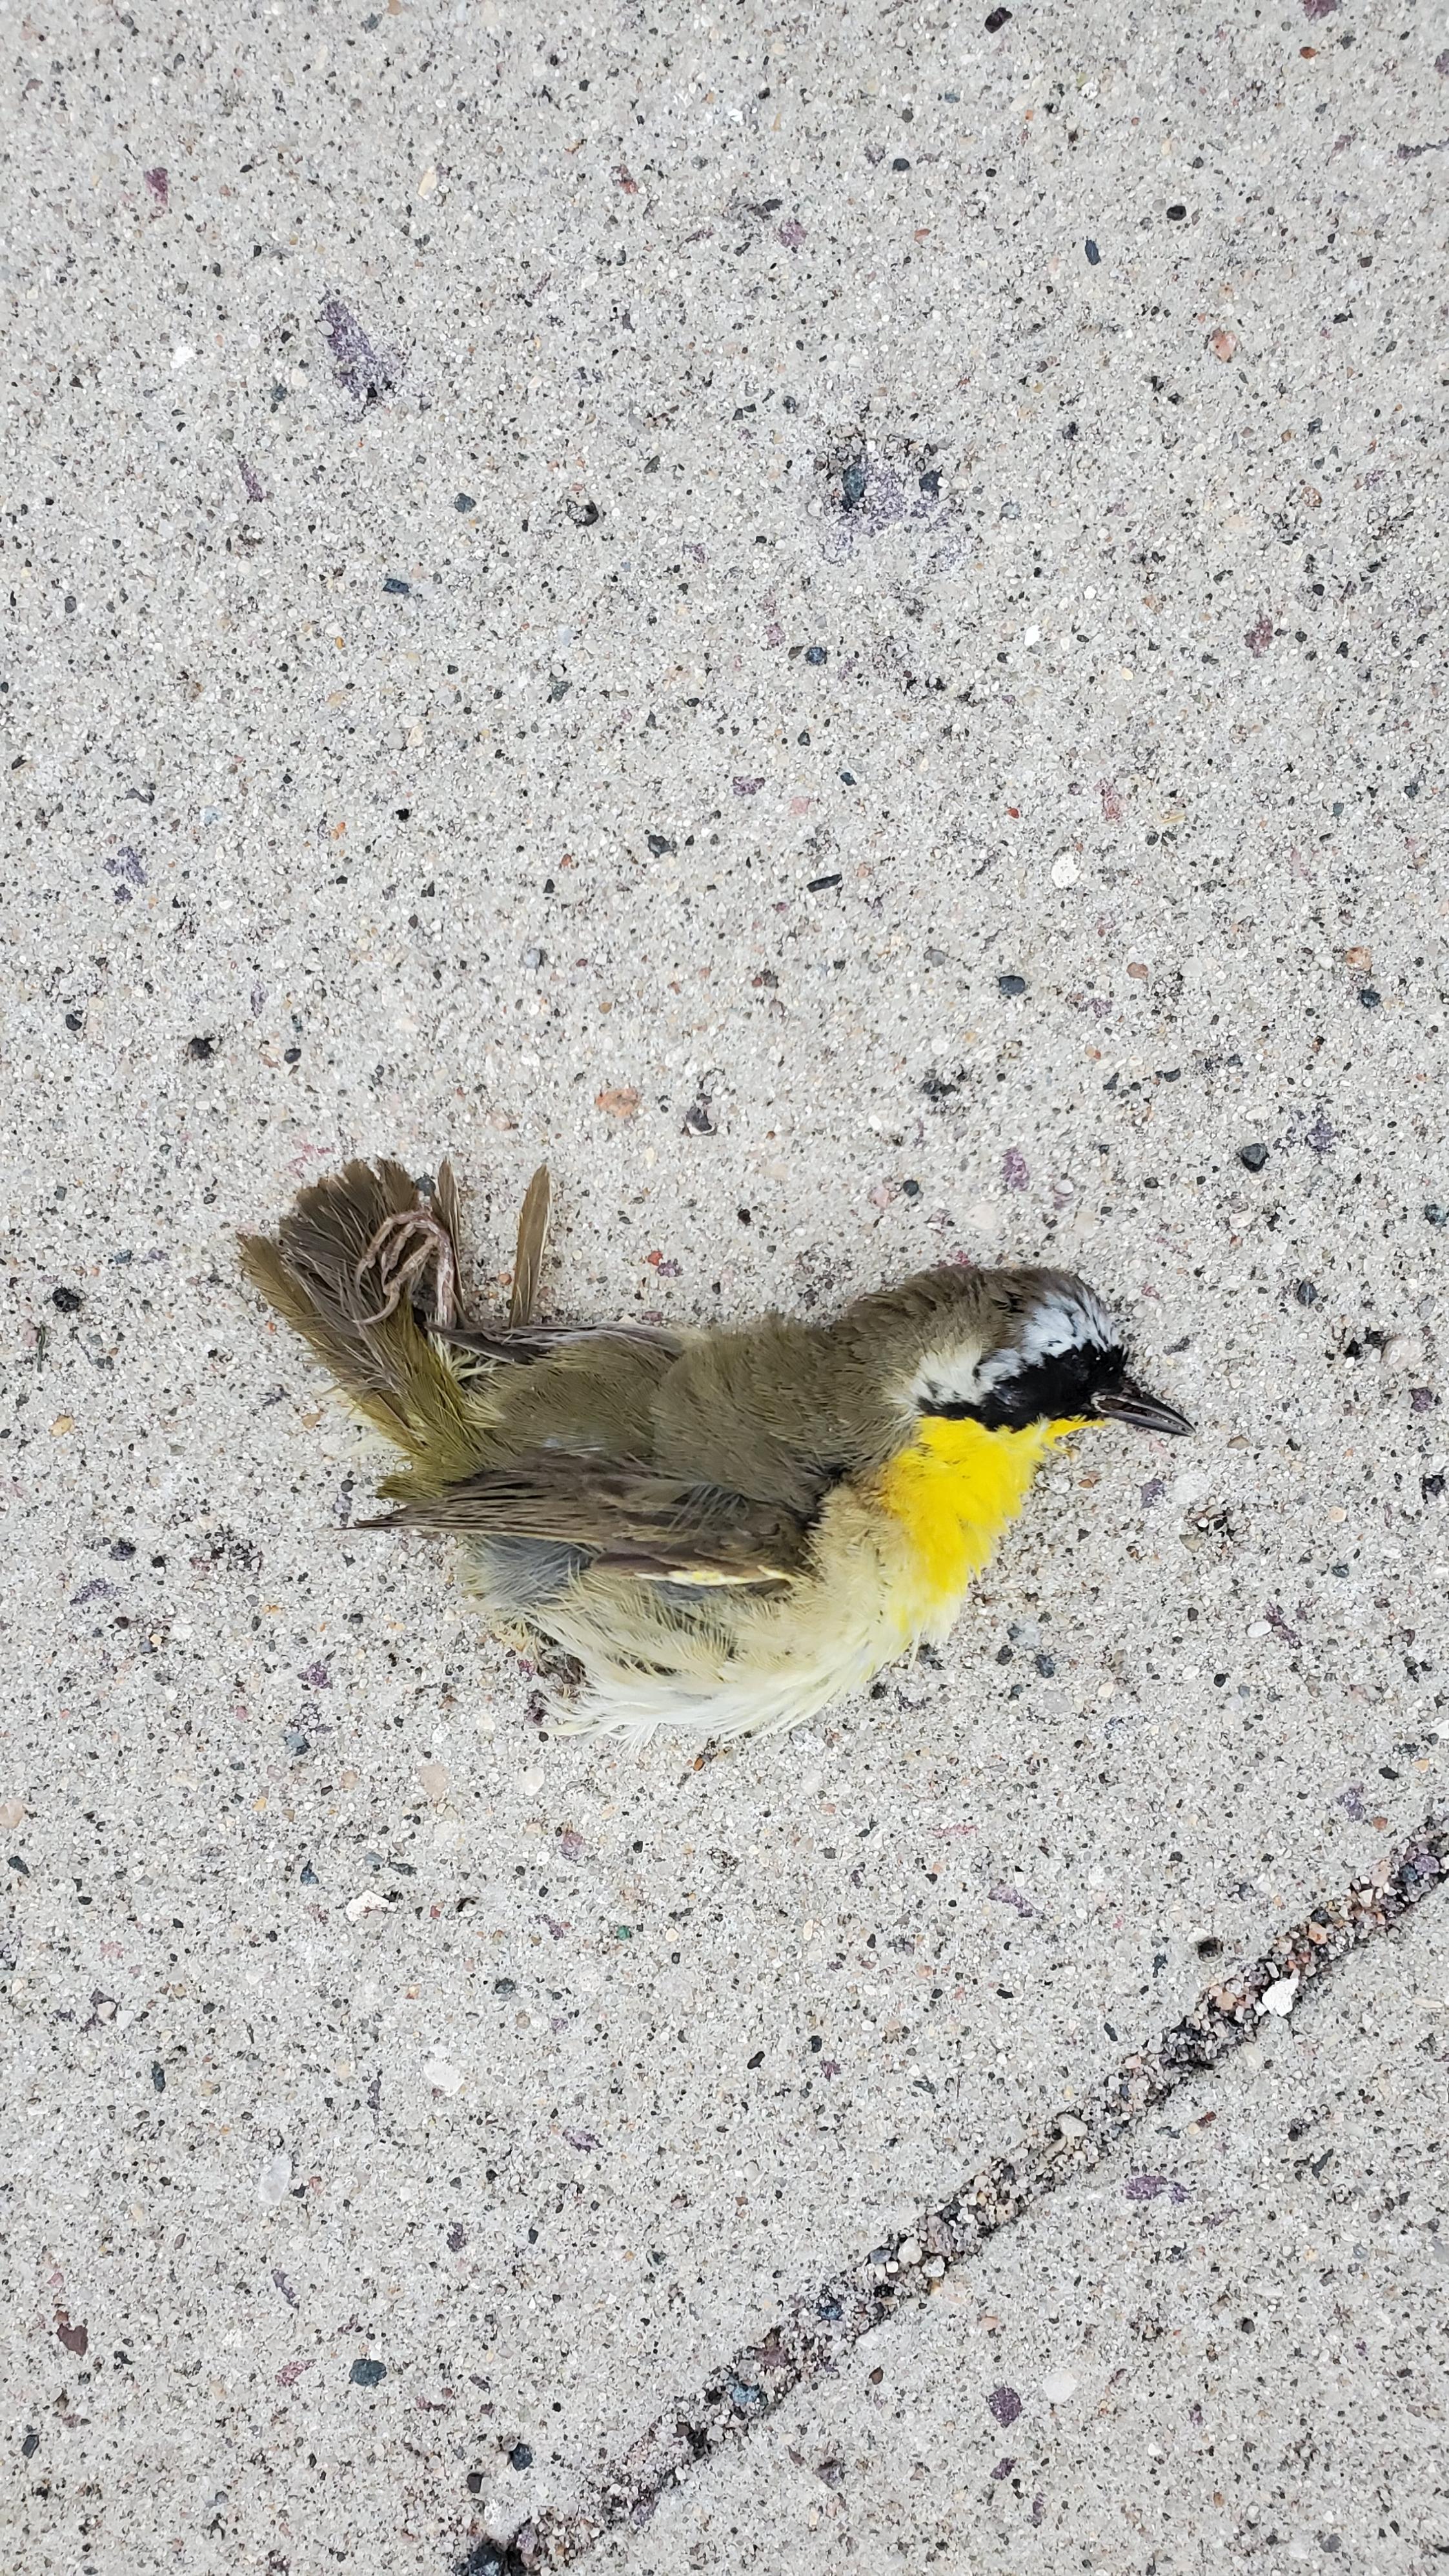 Dead yellow throat